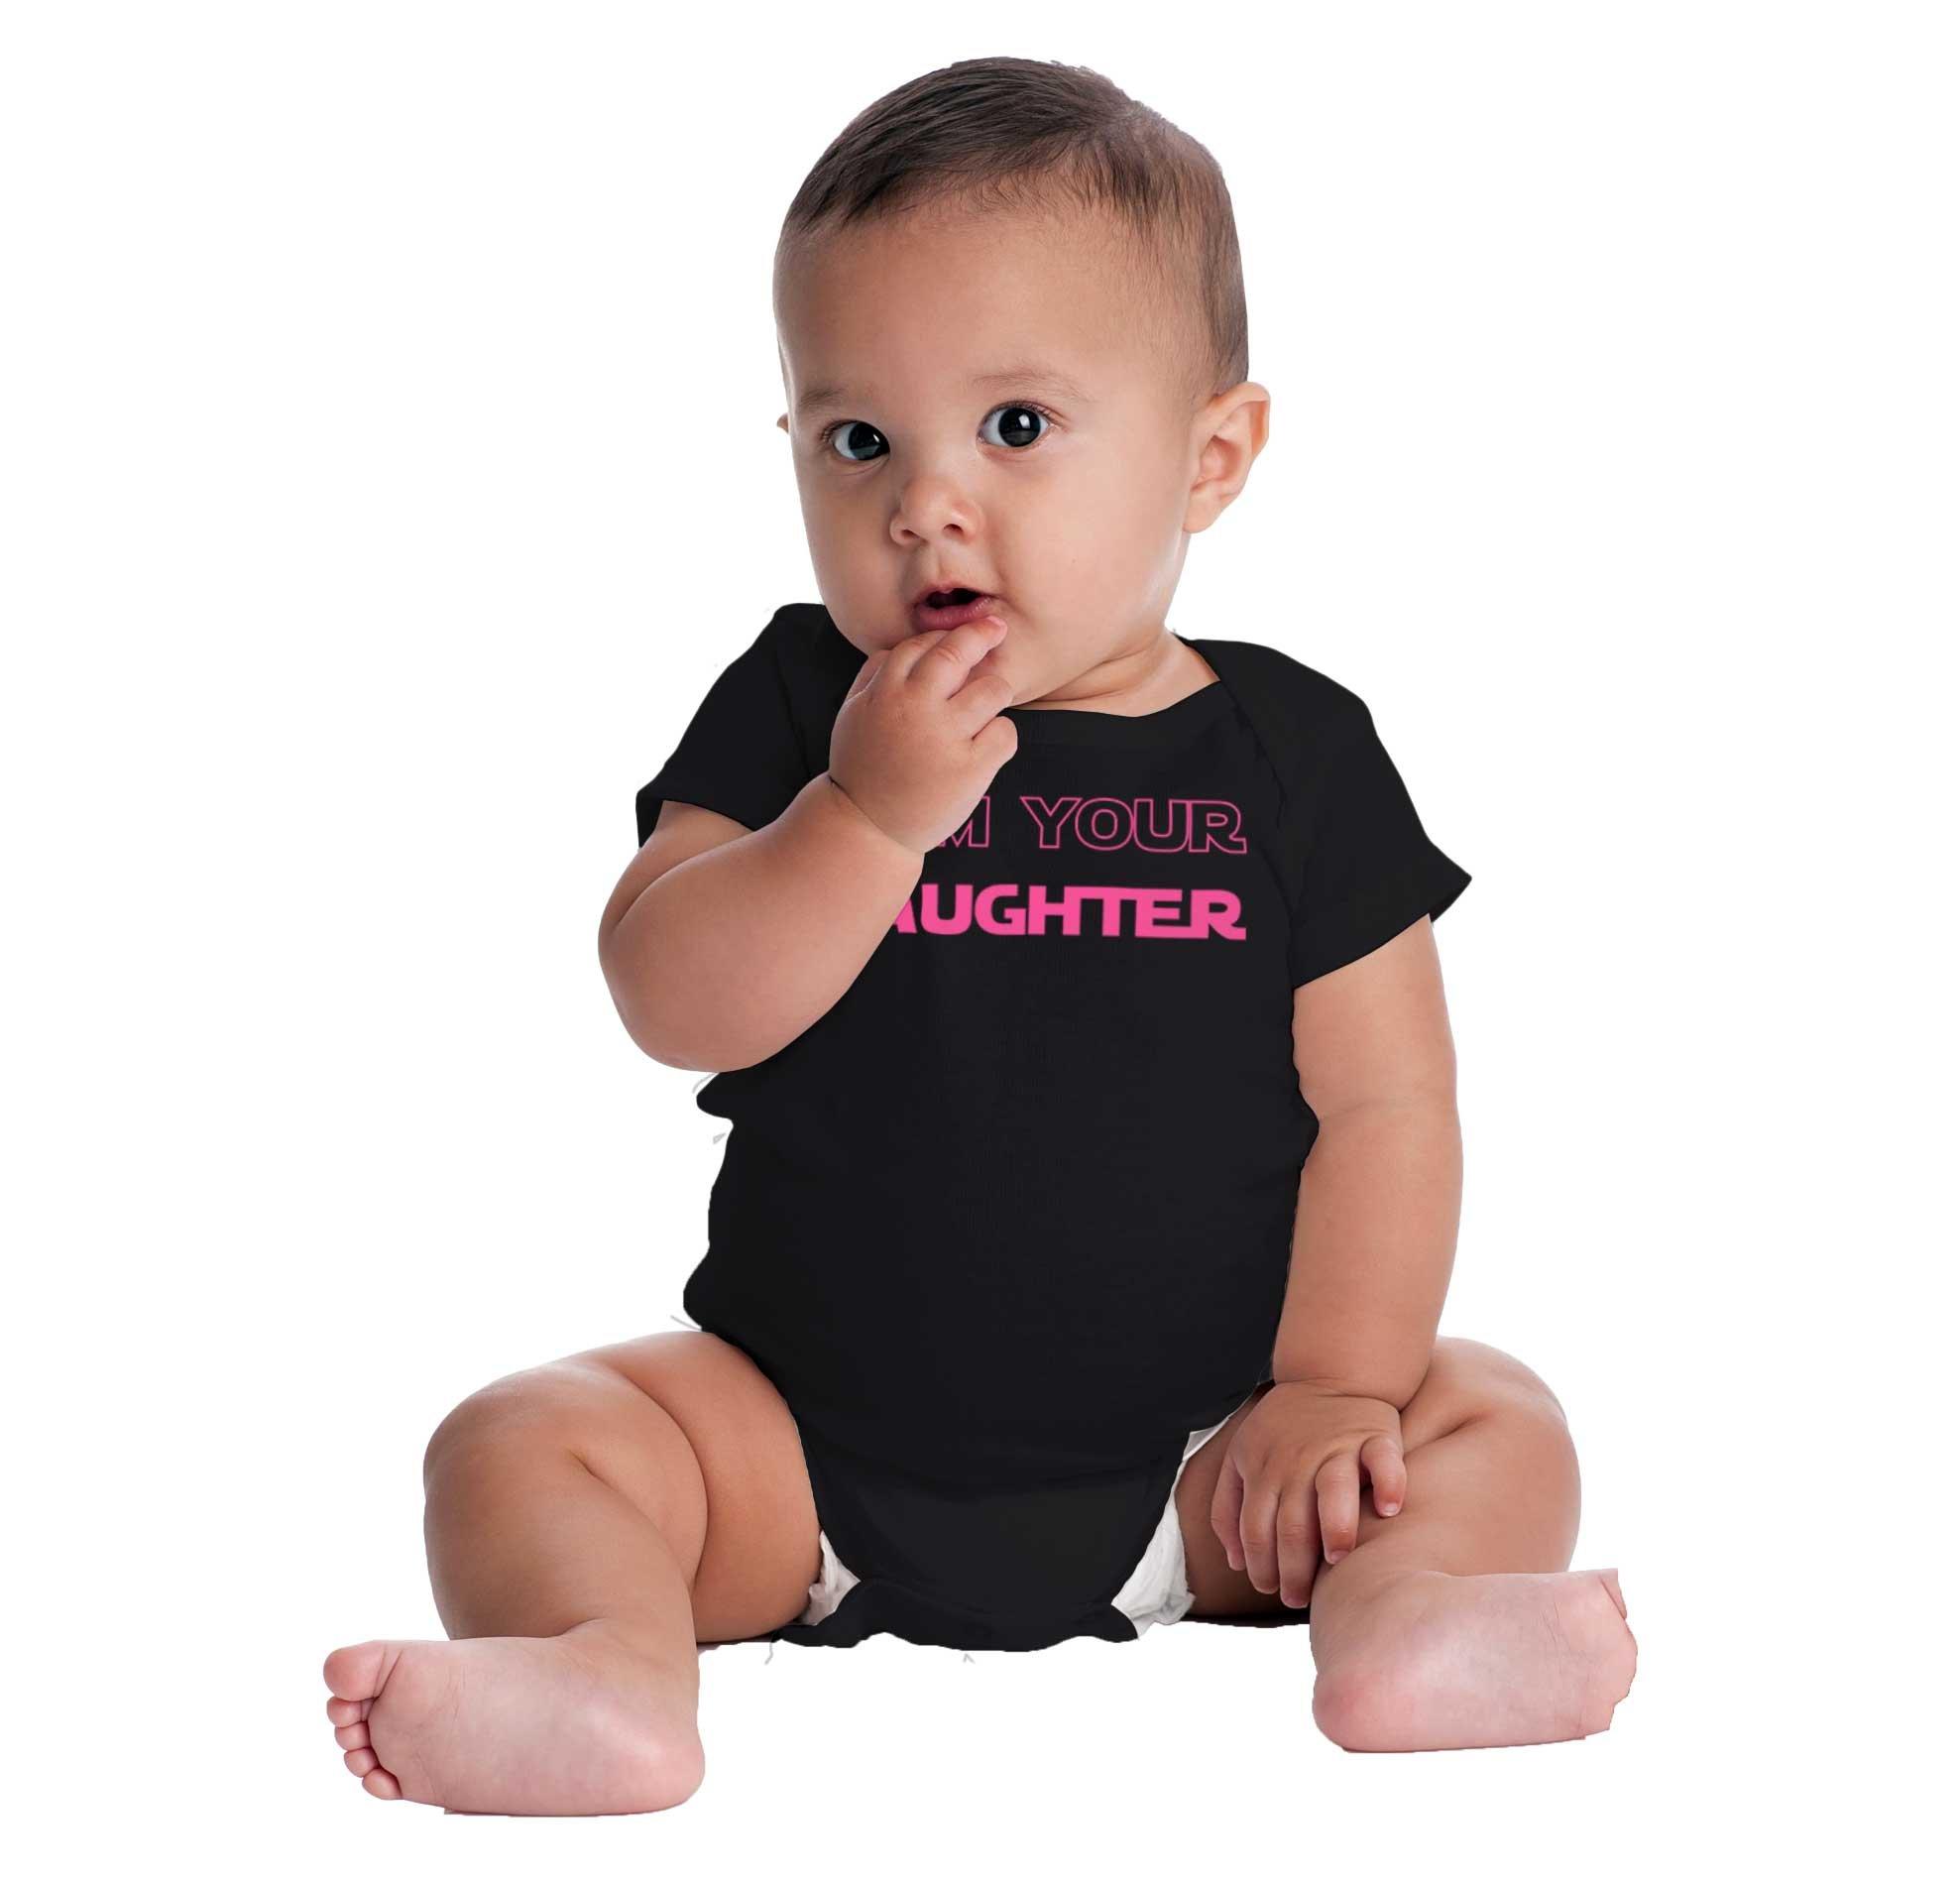 I Am Your Daughter Cute Darth Vader Star Wars Yoda Romper Bodysuit by Brisco Brands (Image #3)